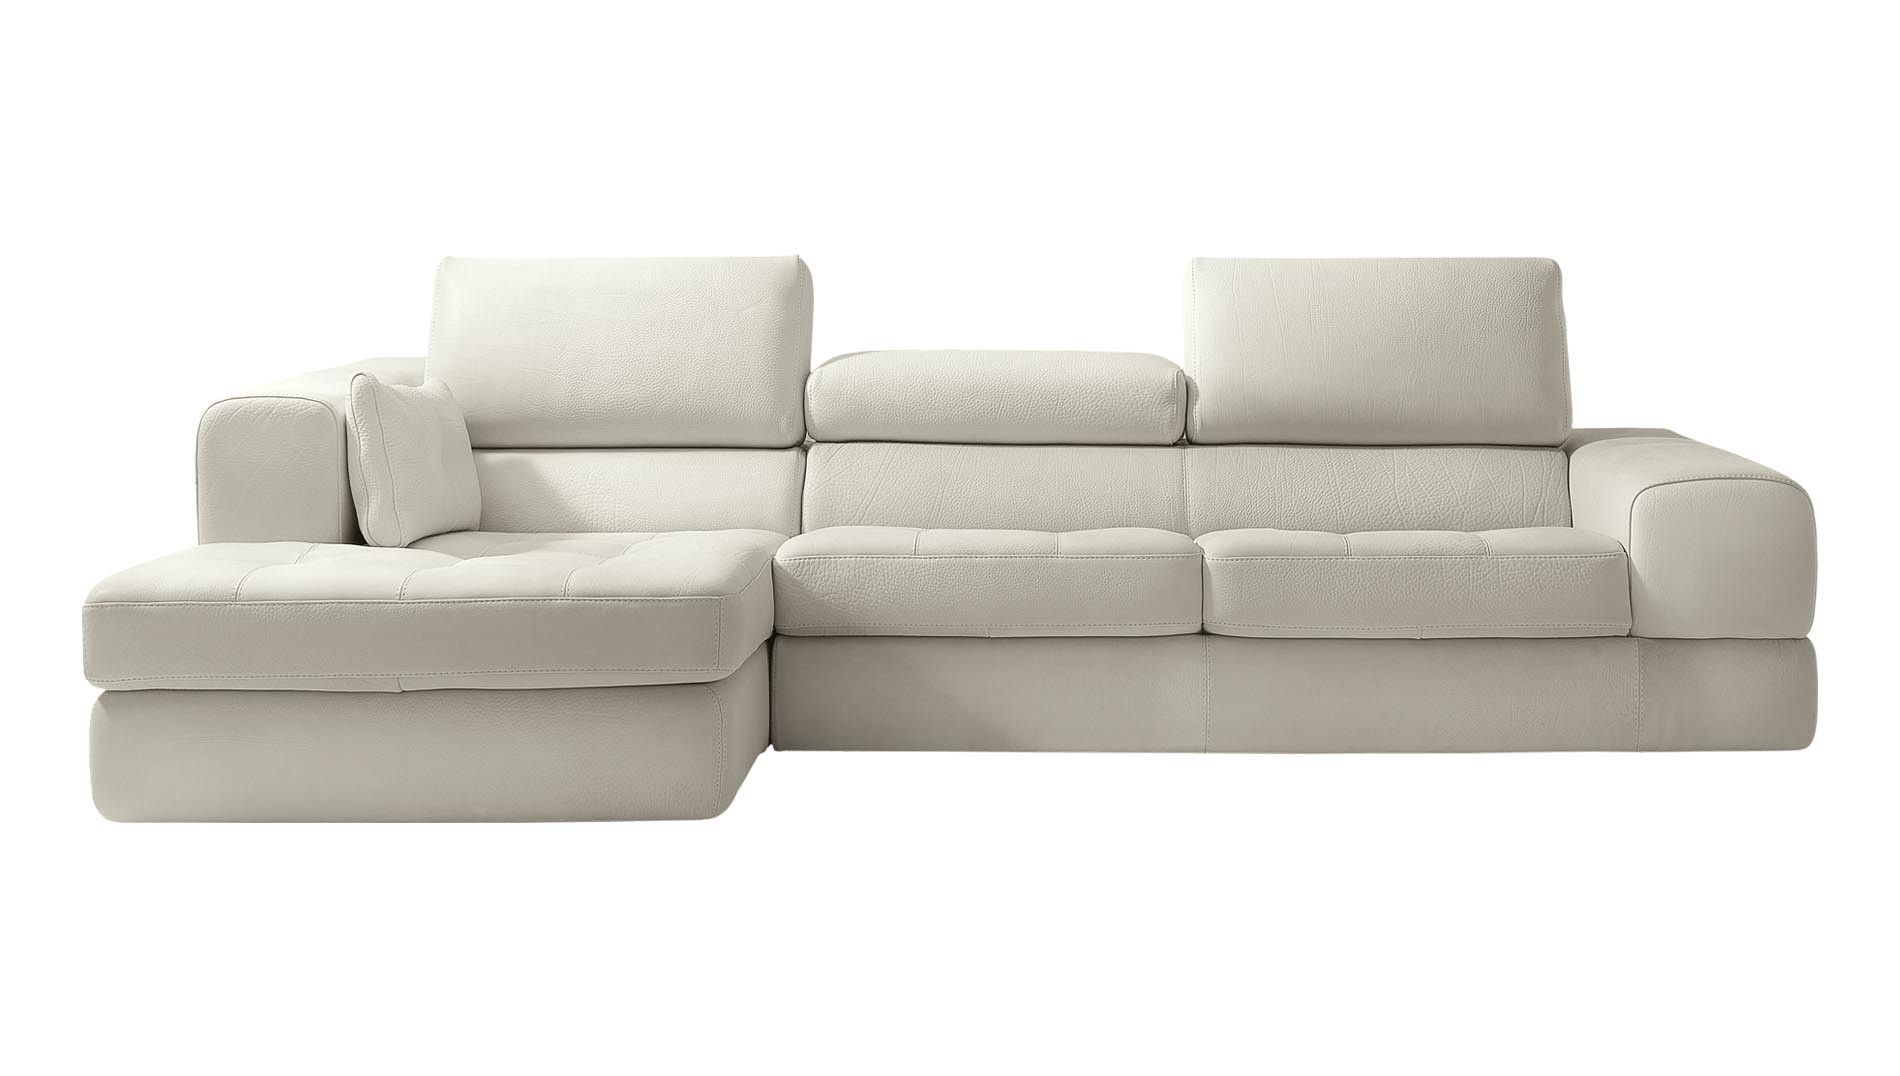 Remarkable Max Divani Antea Corner Sofa Buy Online At Luxdeco Creativecarmelina Interior Chair Design Creativecarmelinacom